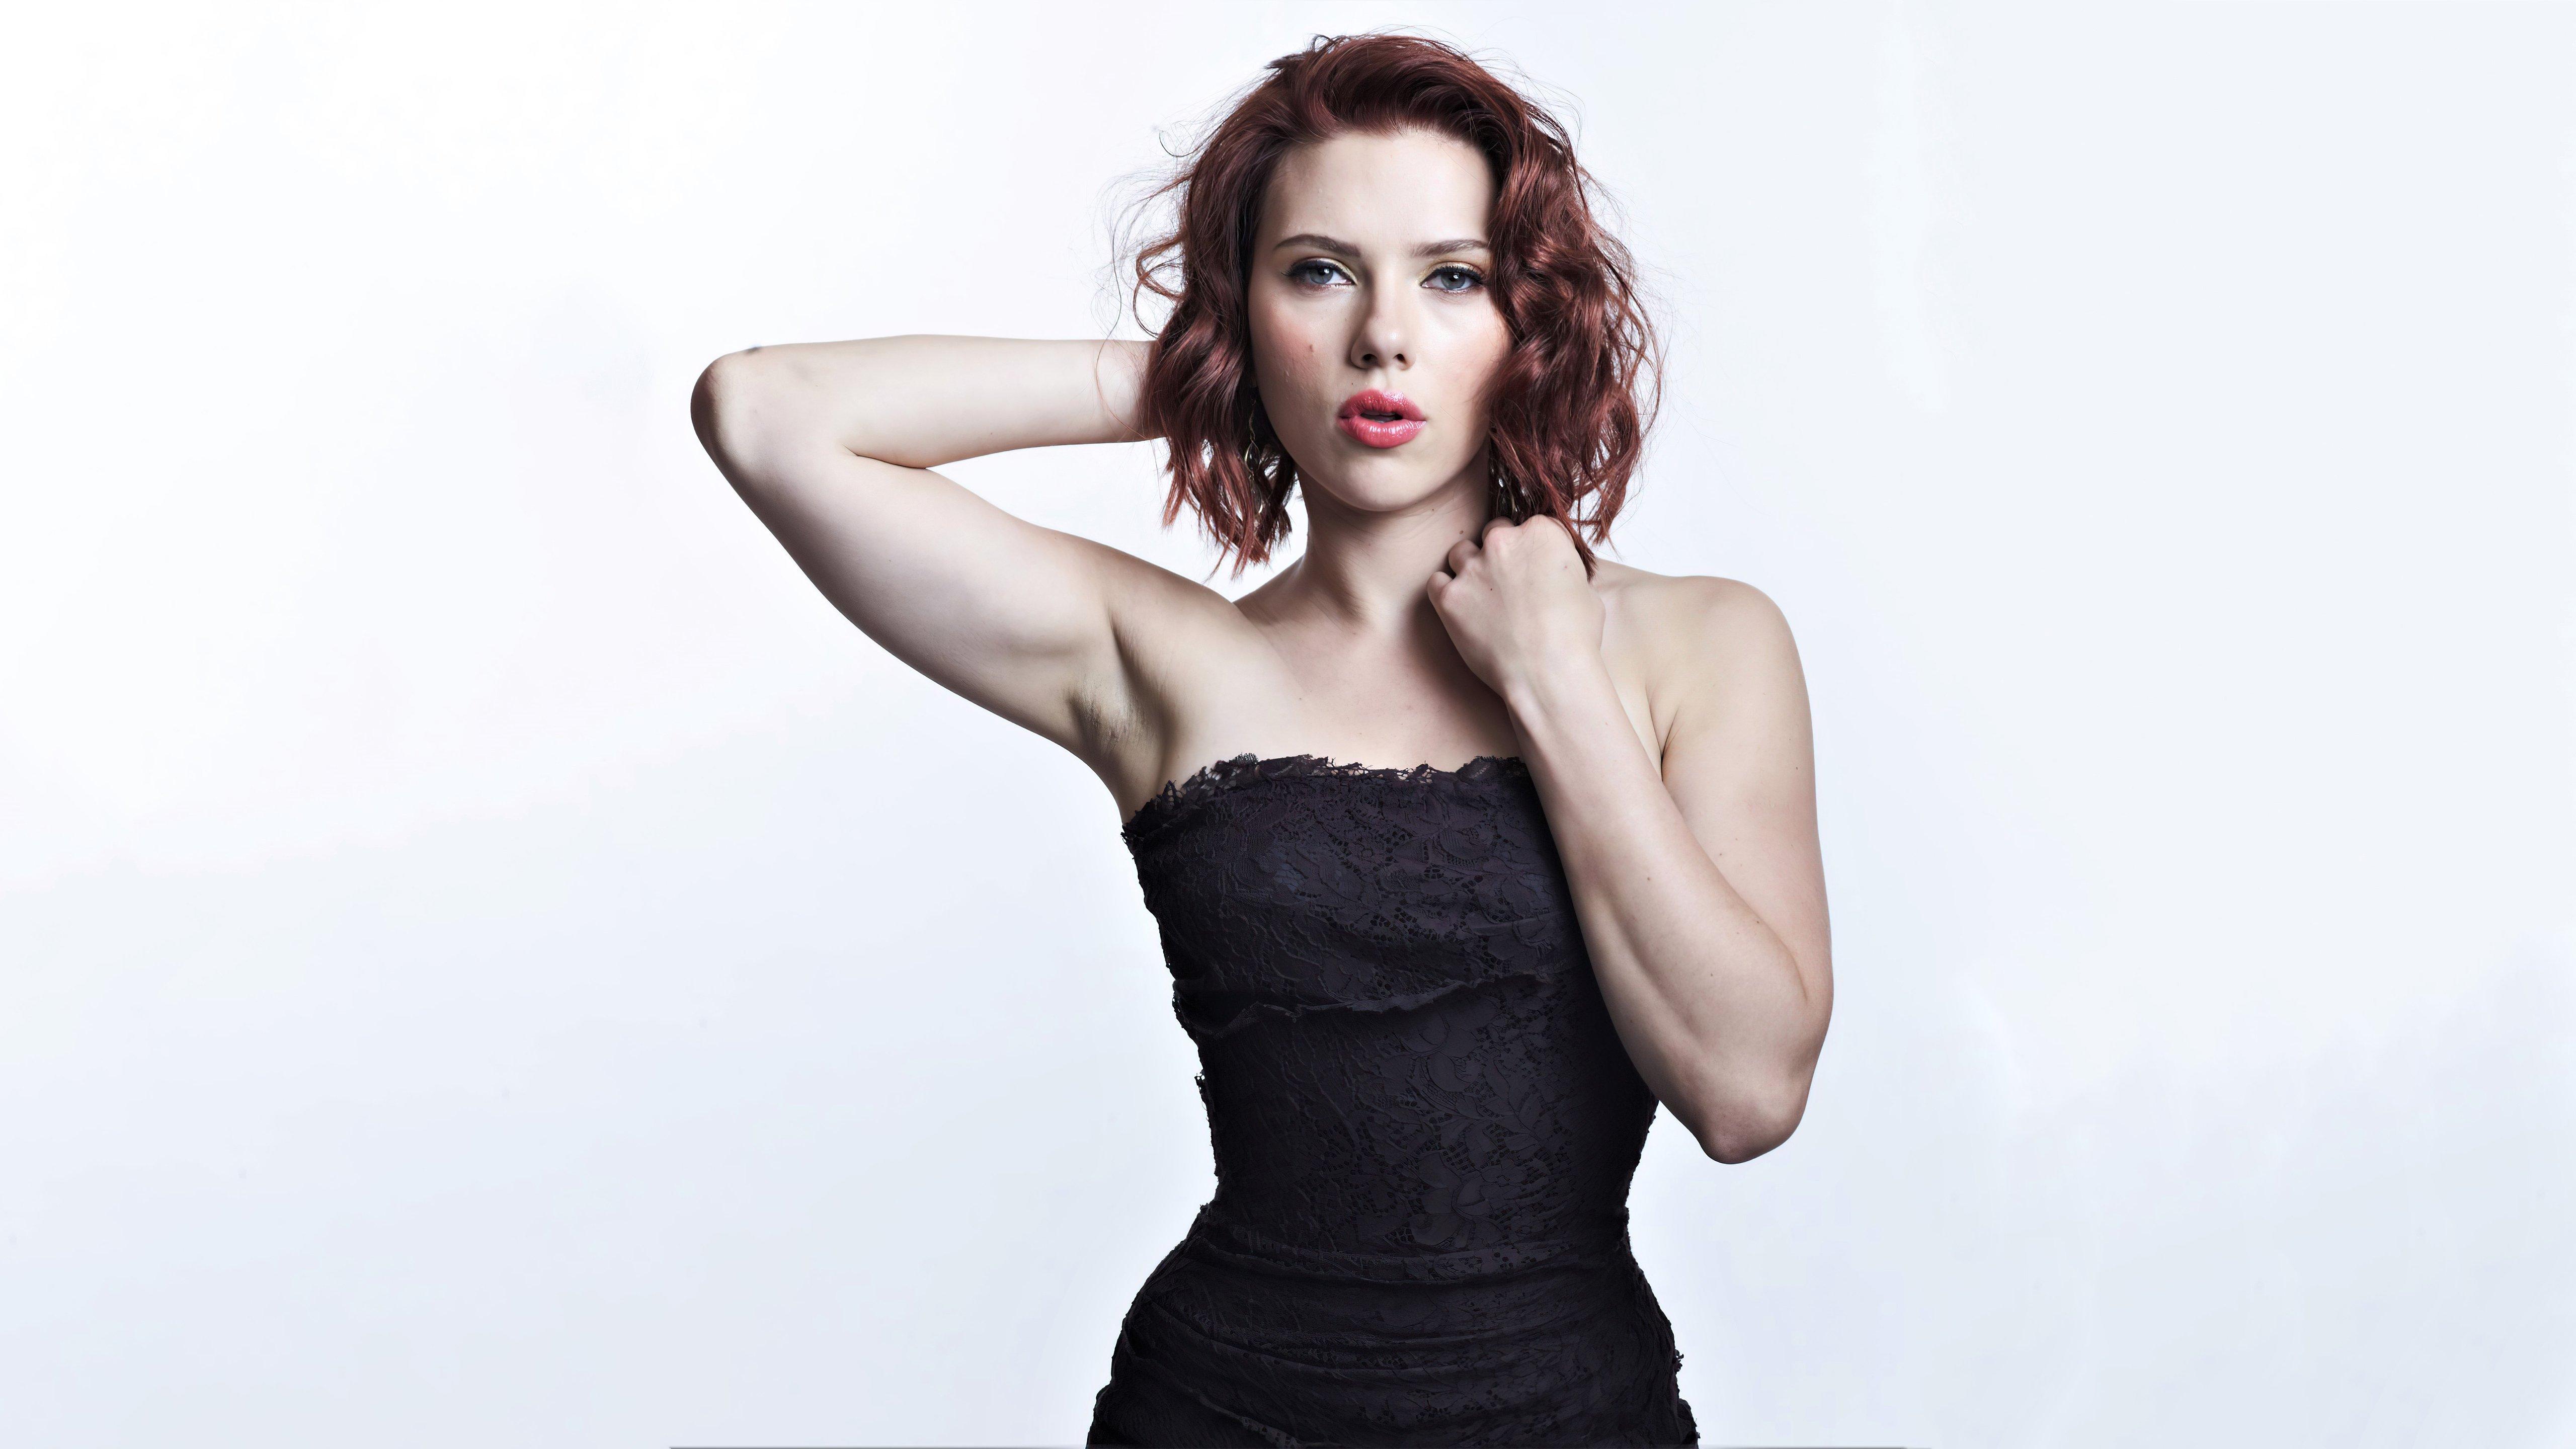 Fondos de pantalla Scarlett Johansson con vestido negro